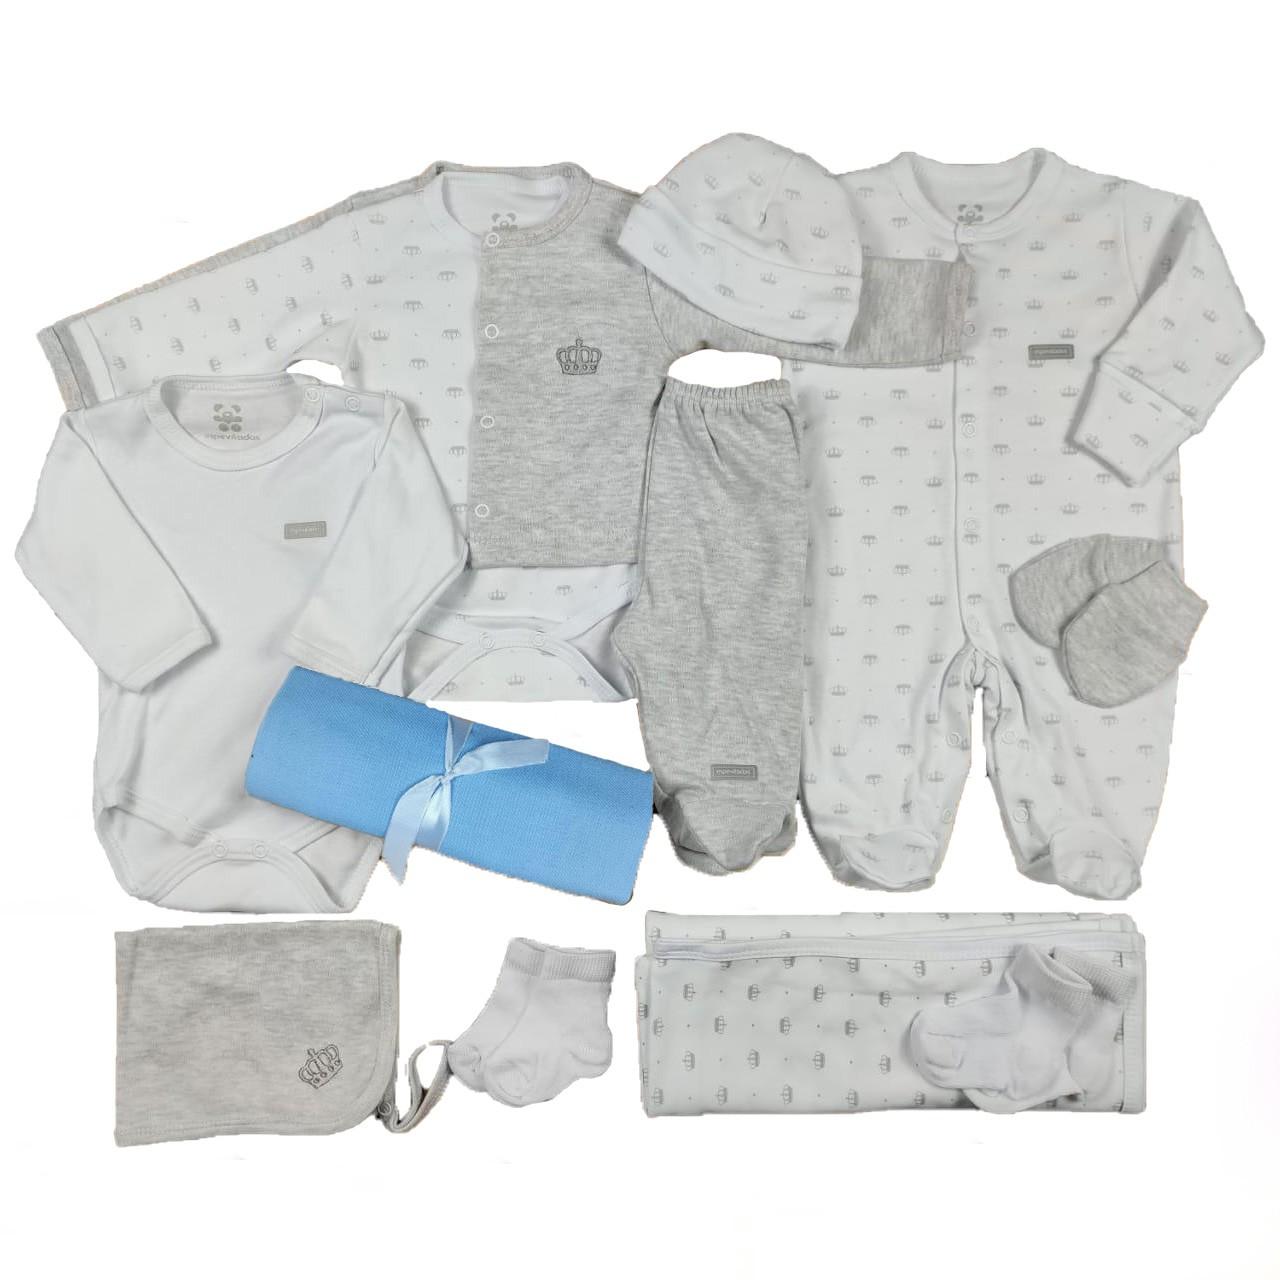 Kit Maternidade Branco e Mescla - 12 Peças